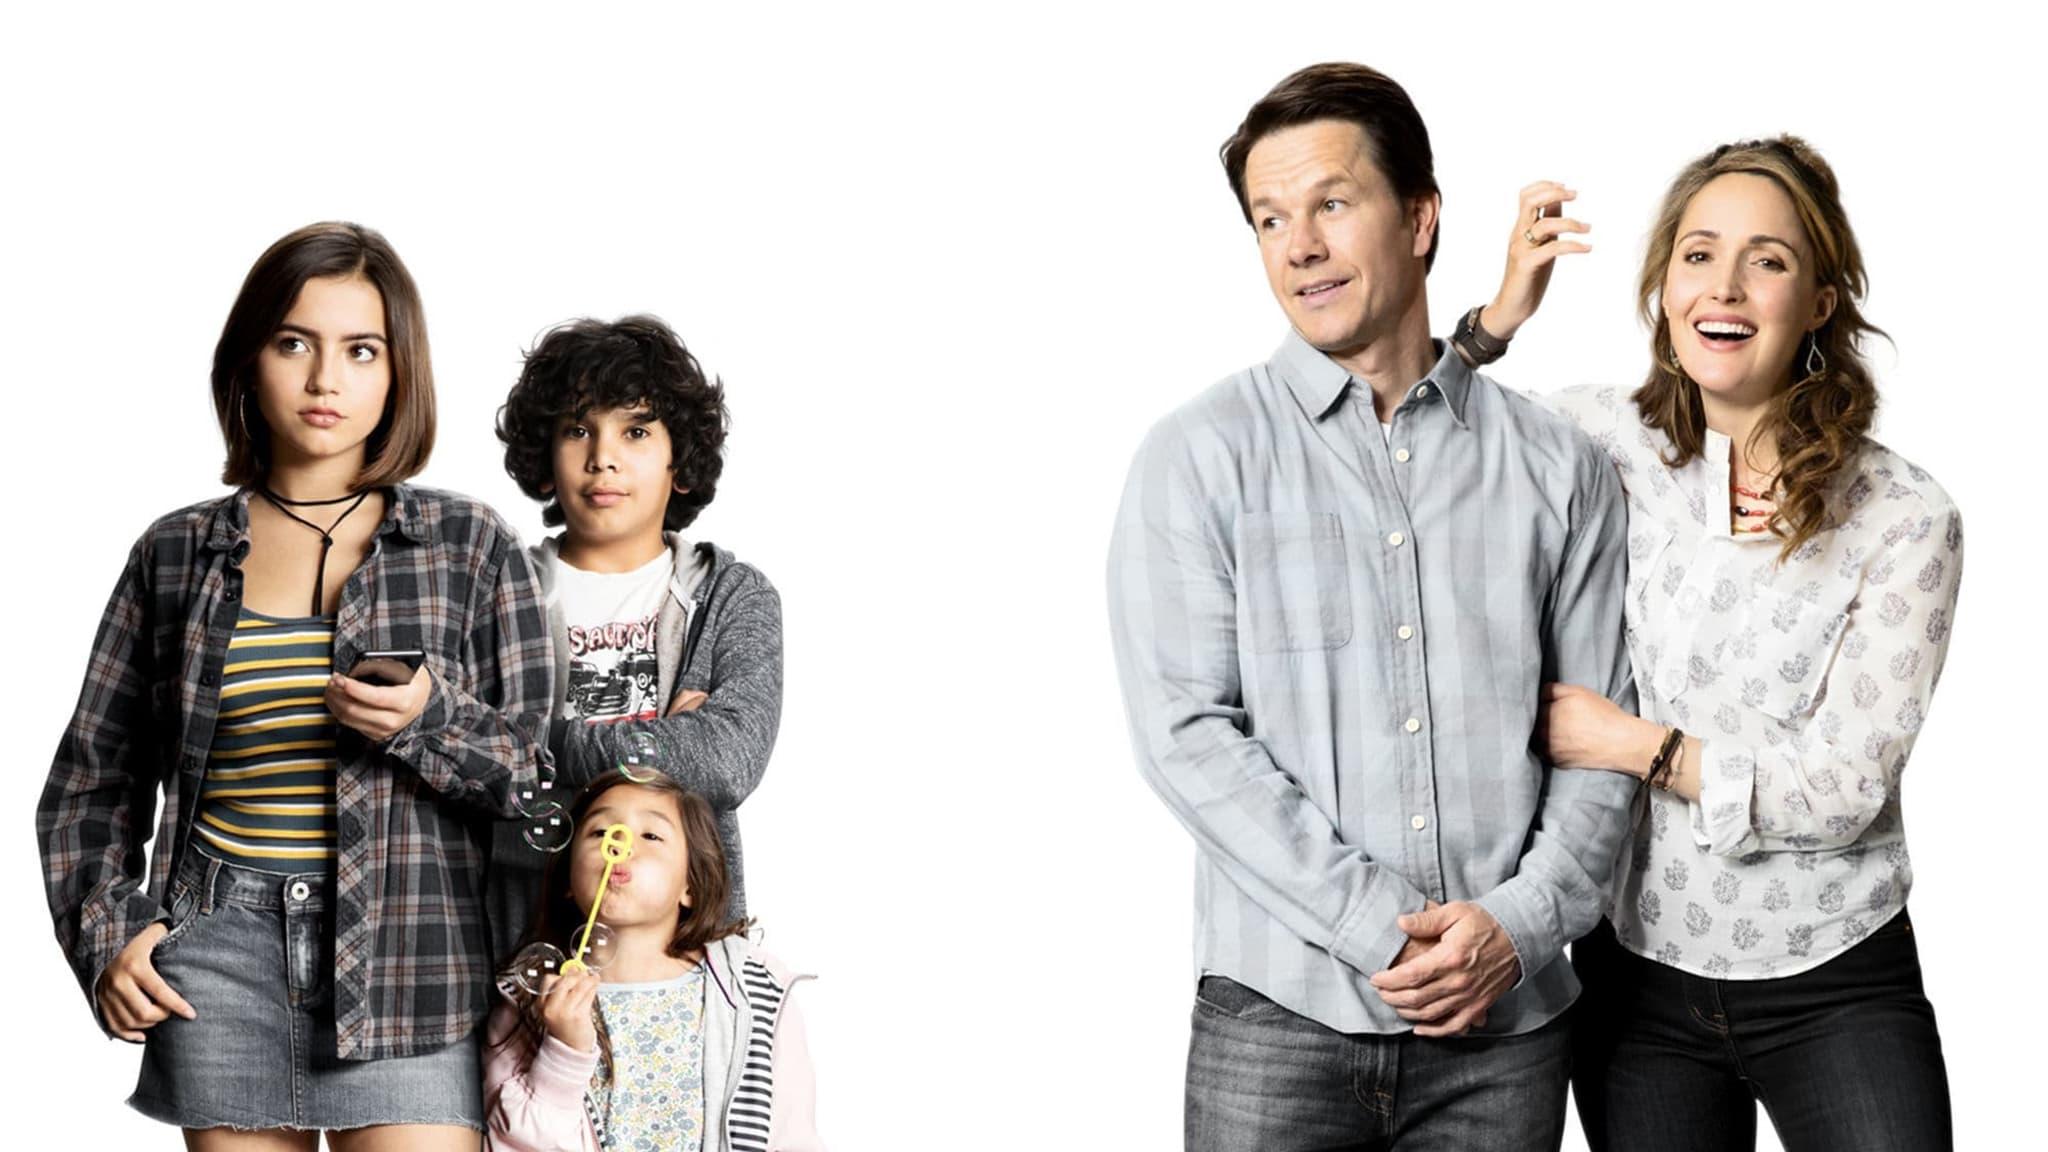 Movie – Instant Family